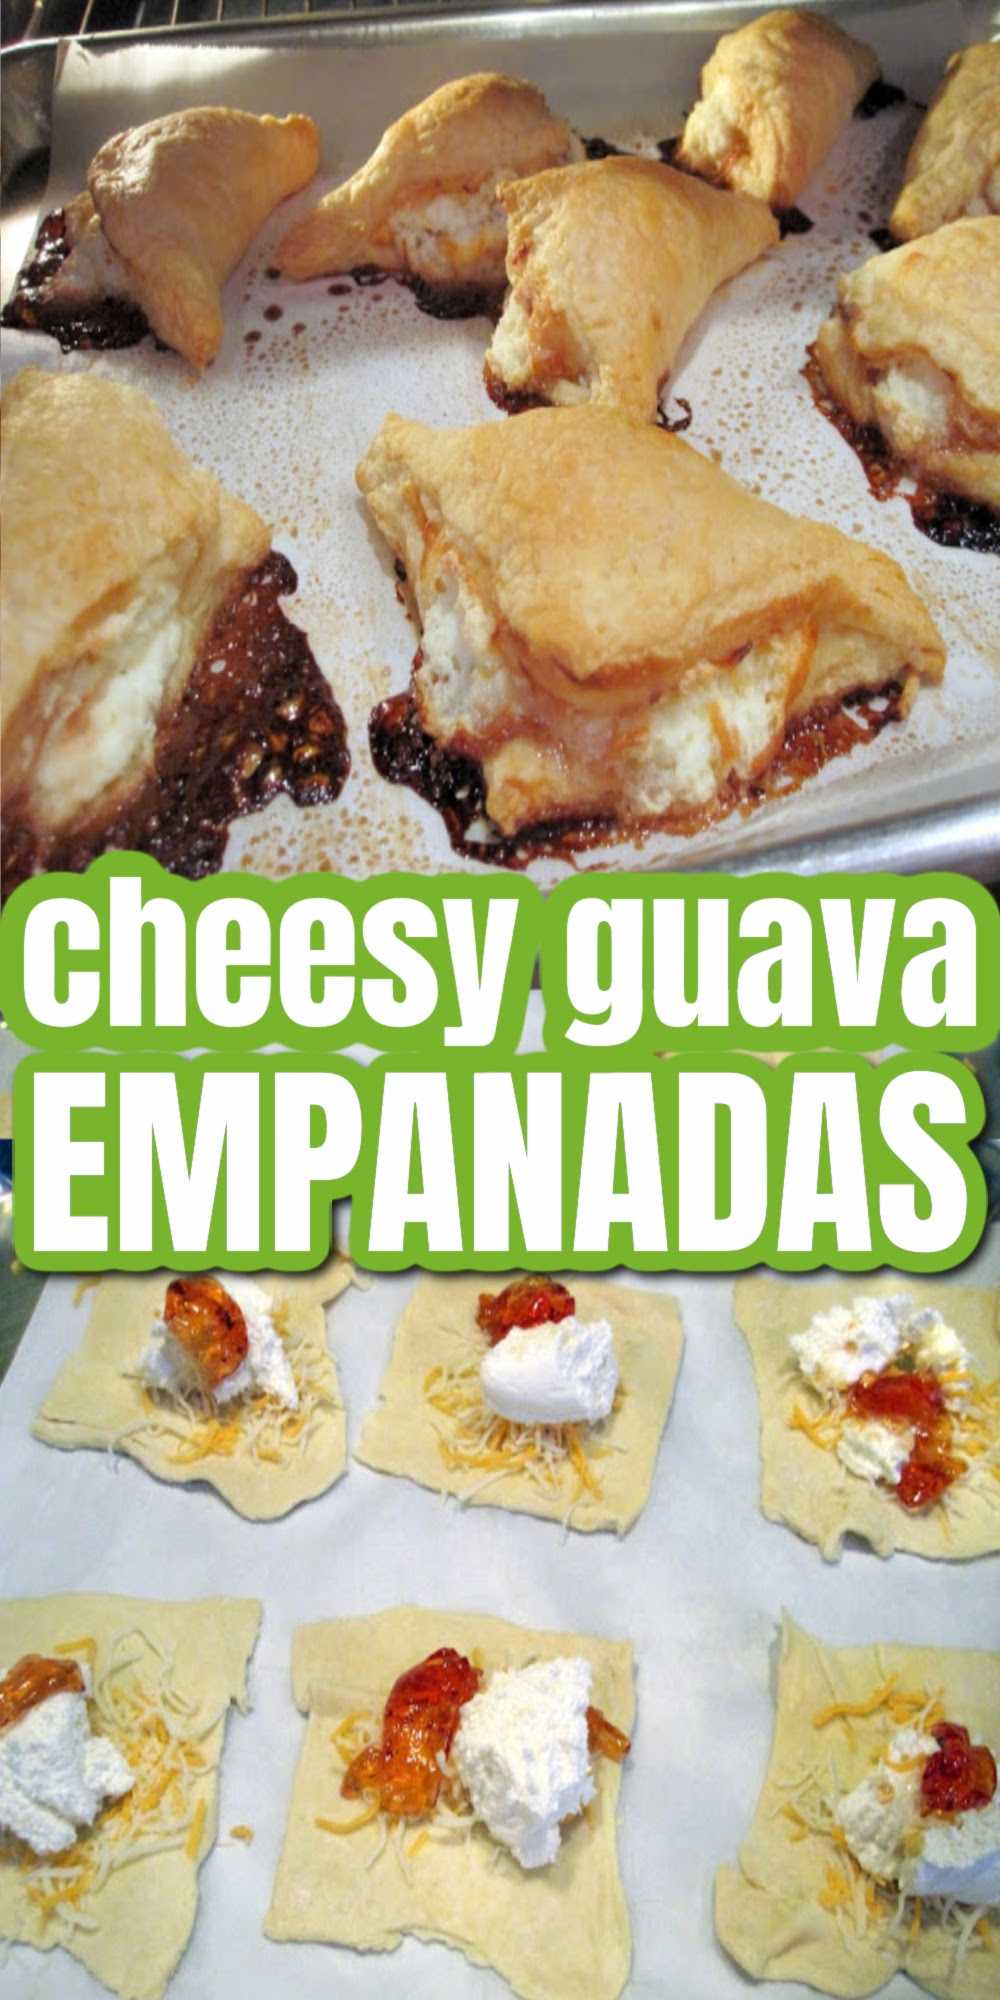 How to make guava empanadas delicious easy recipe